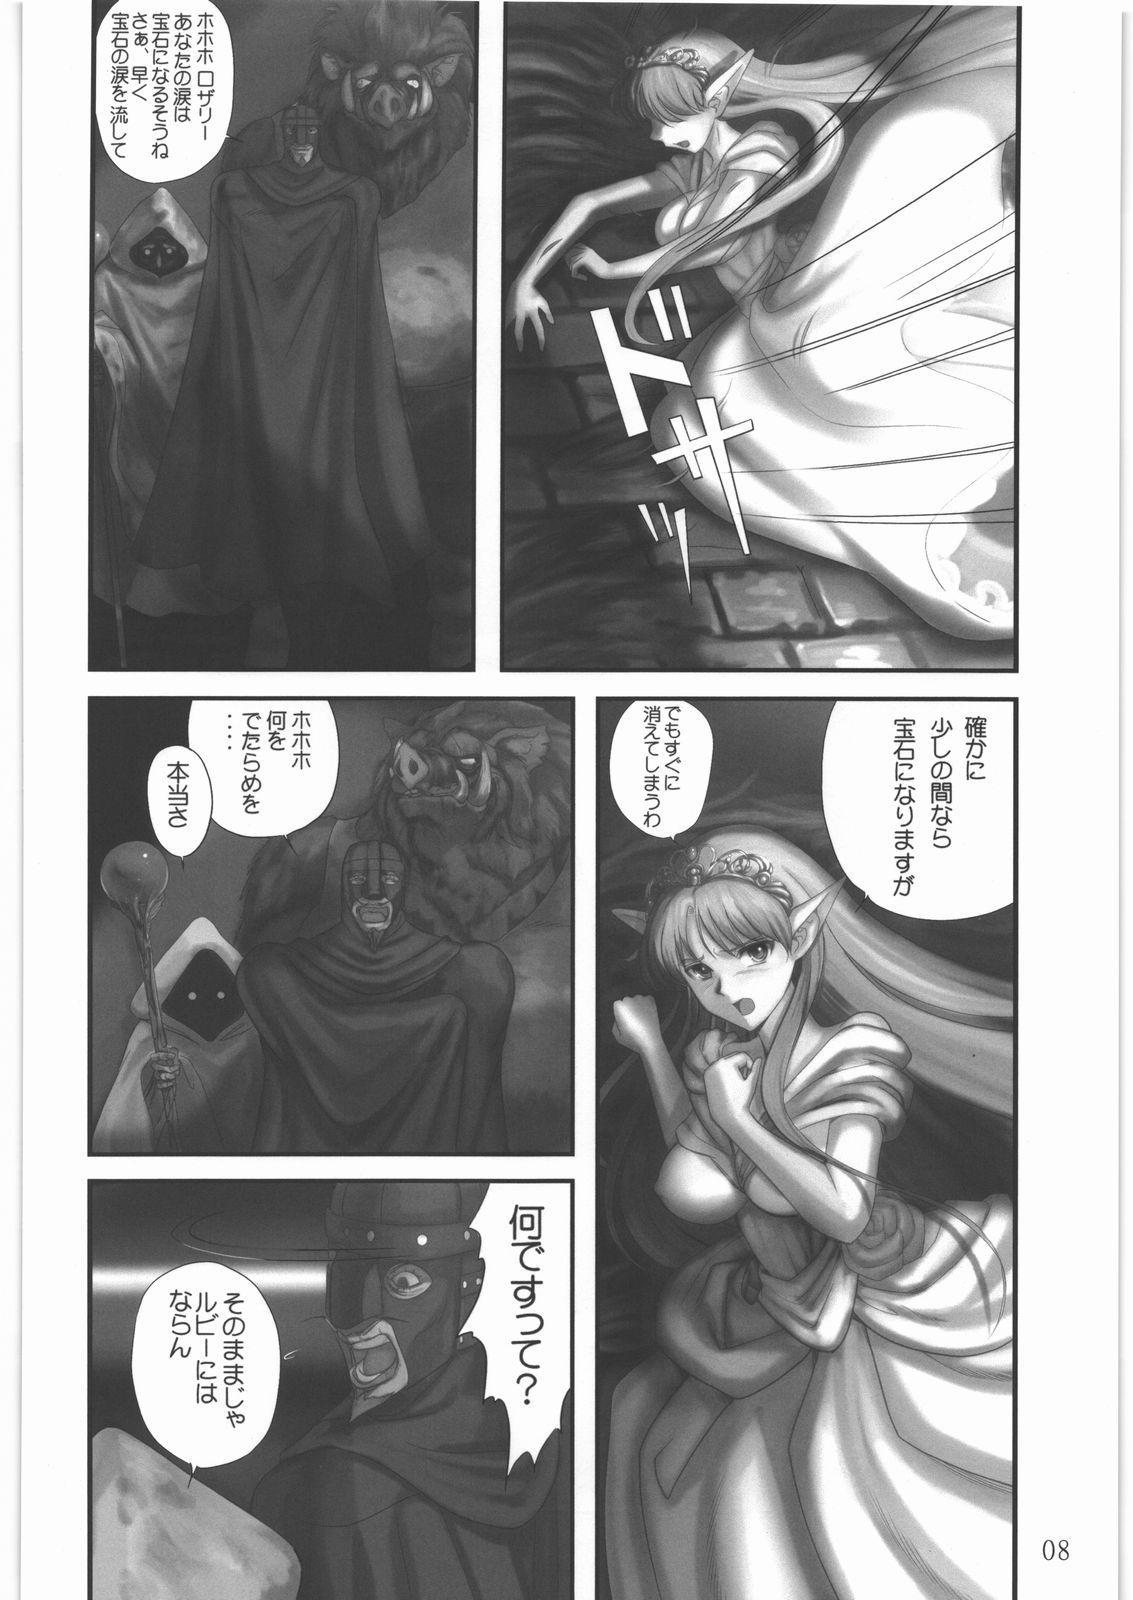 Elf Ryoujoku 6